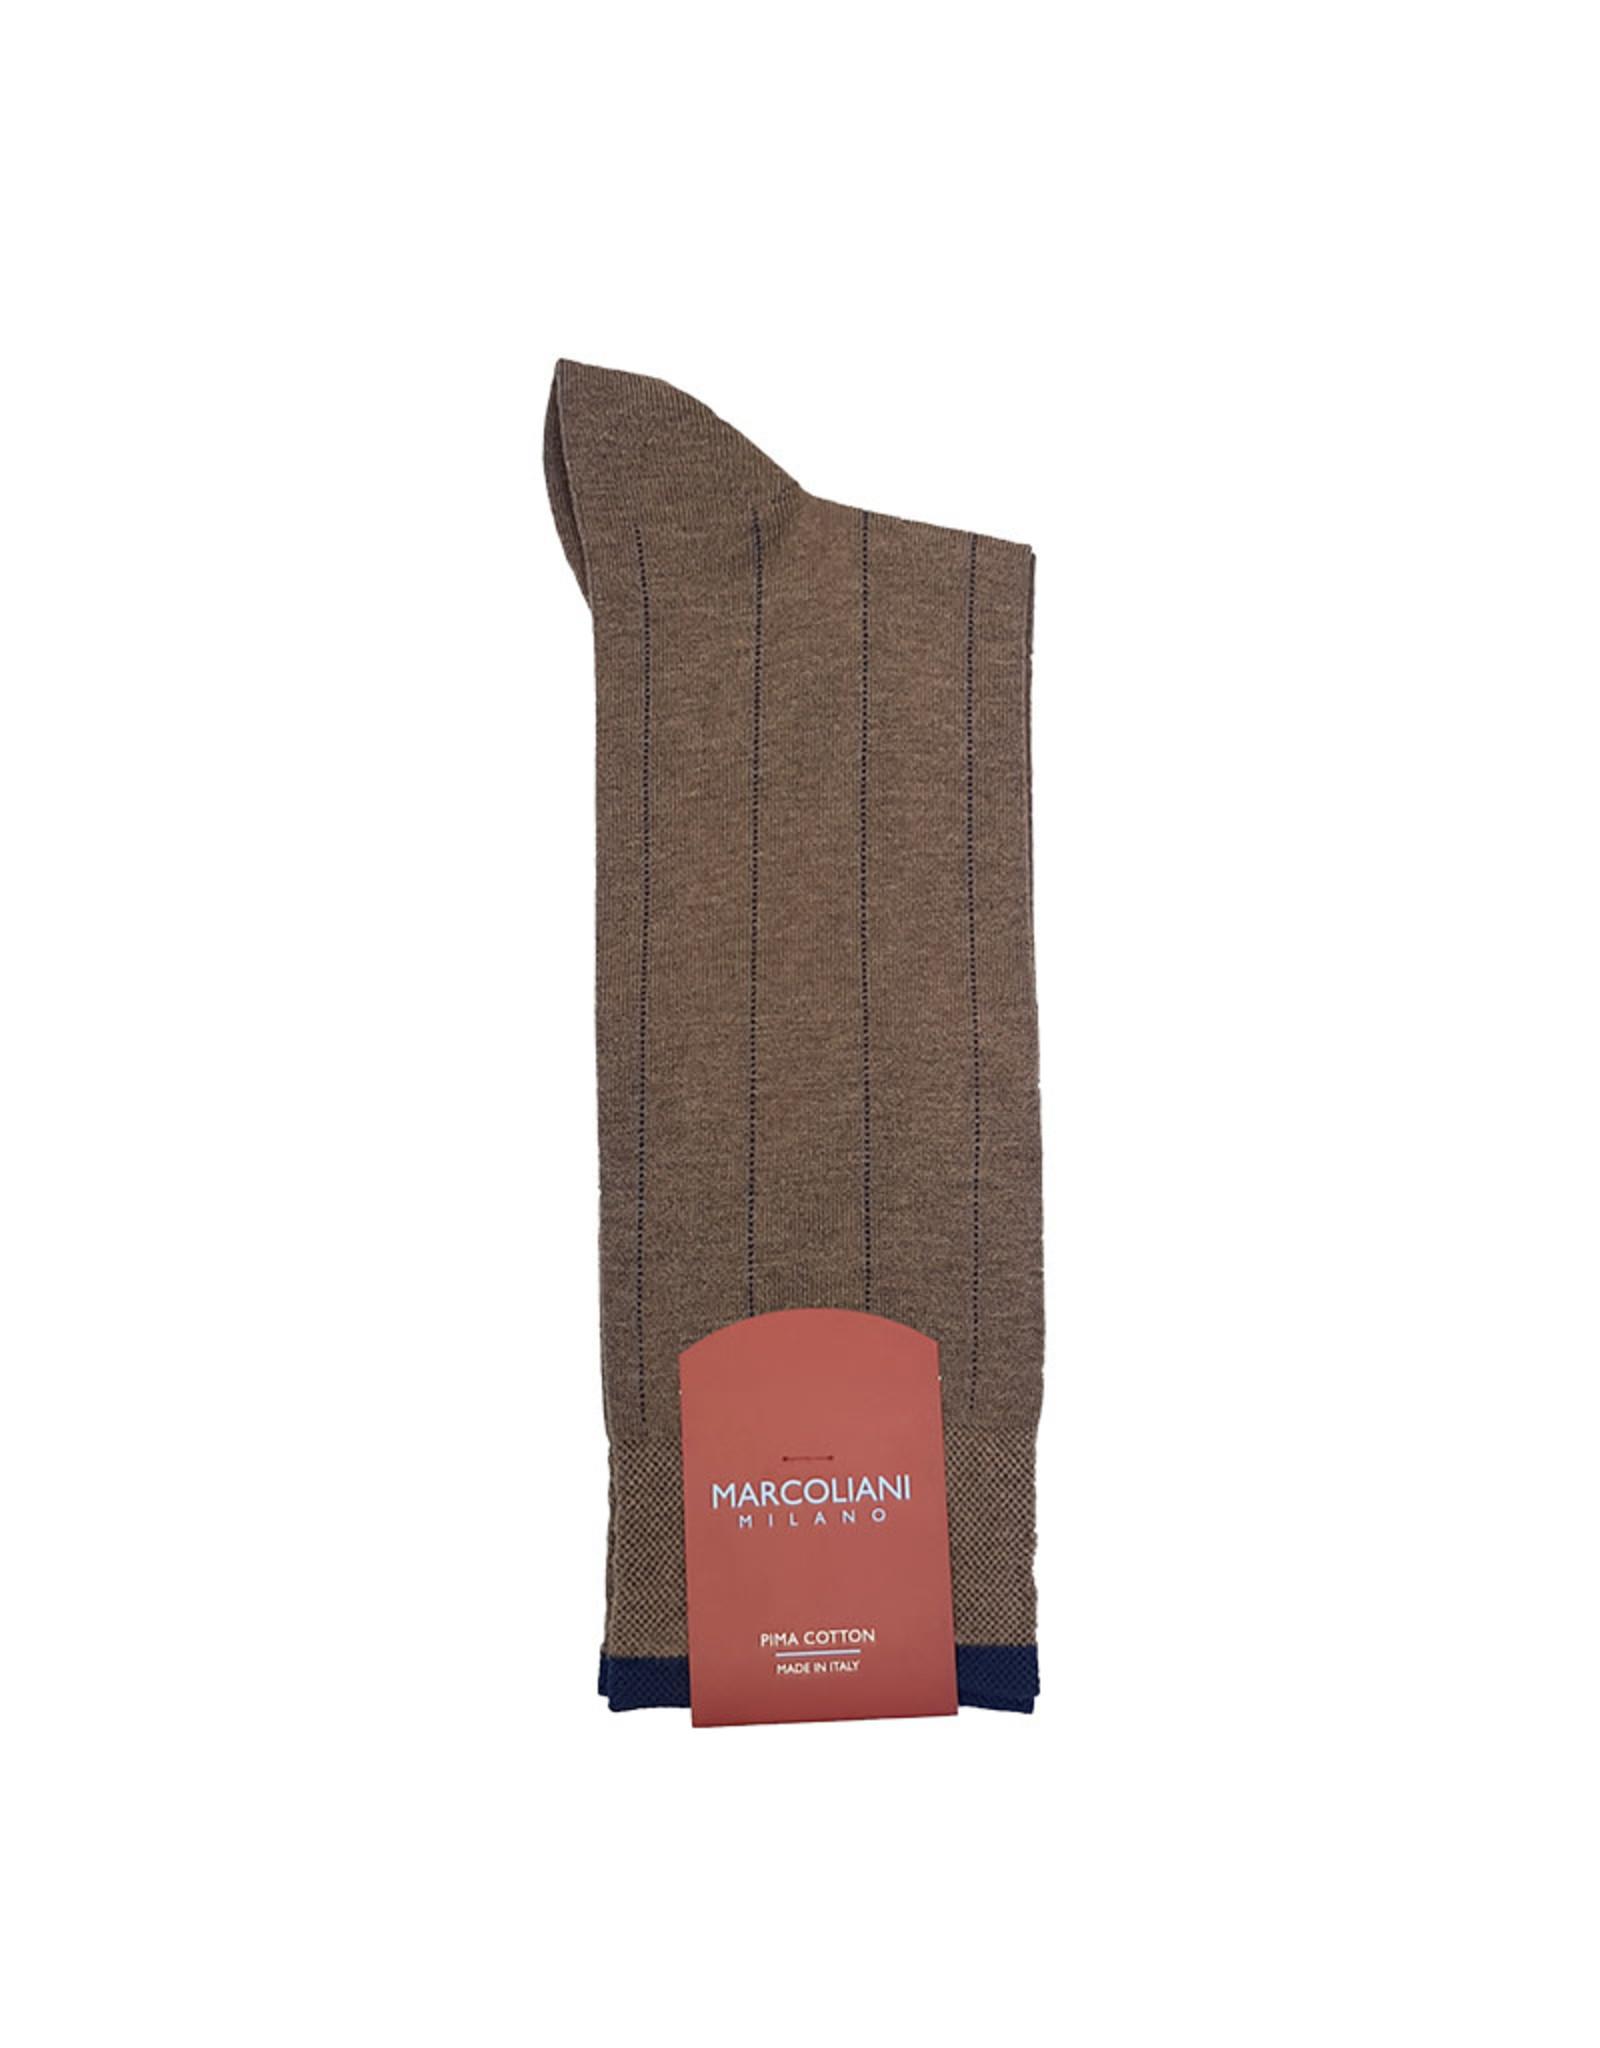 Marcoliani Marcoliani sokken cappucino katoen 4301T